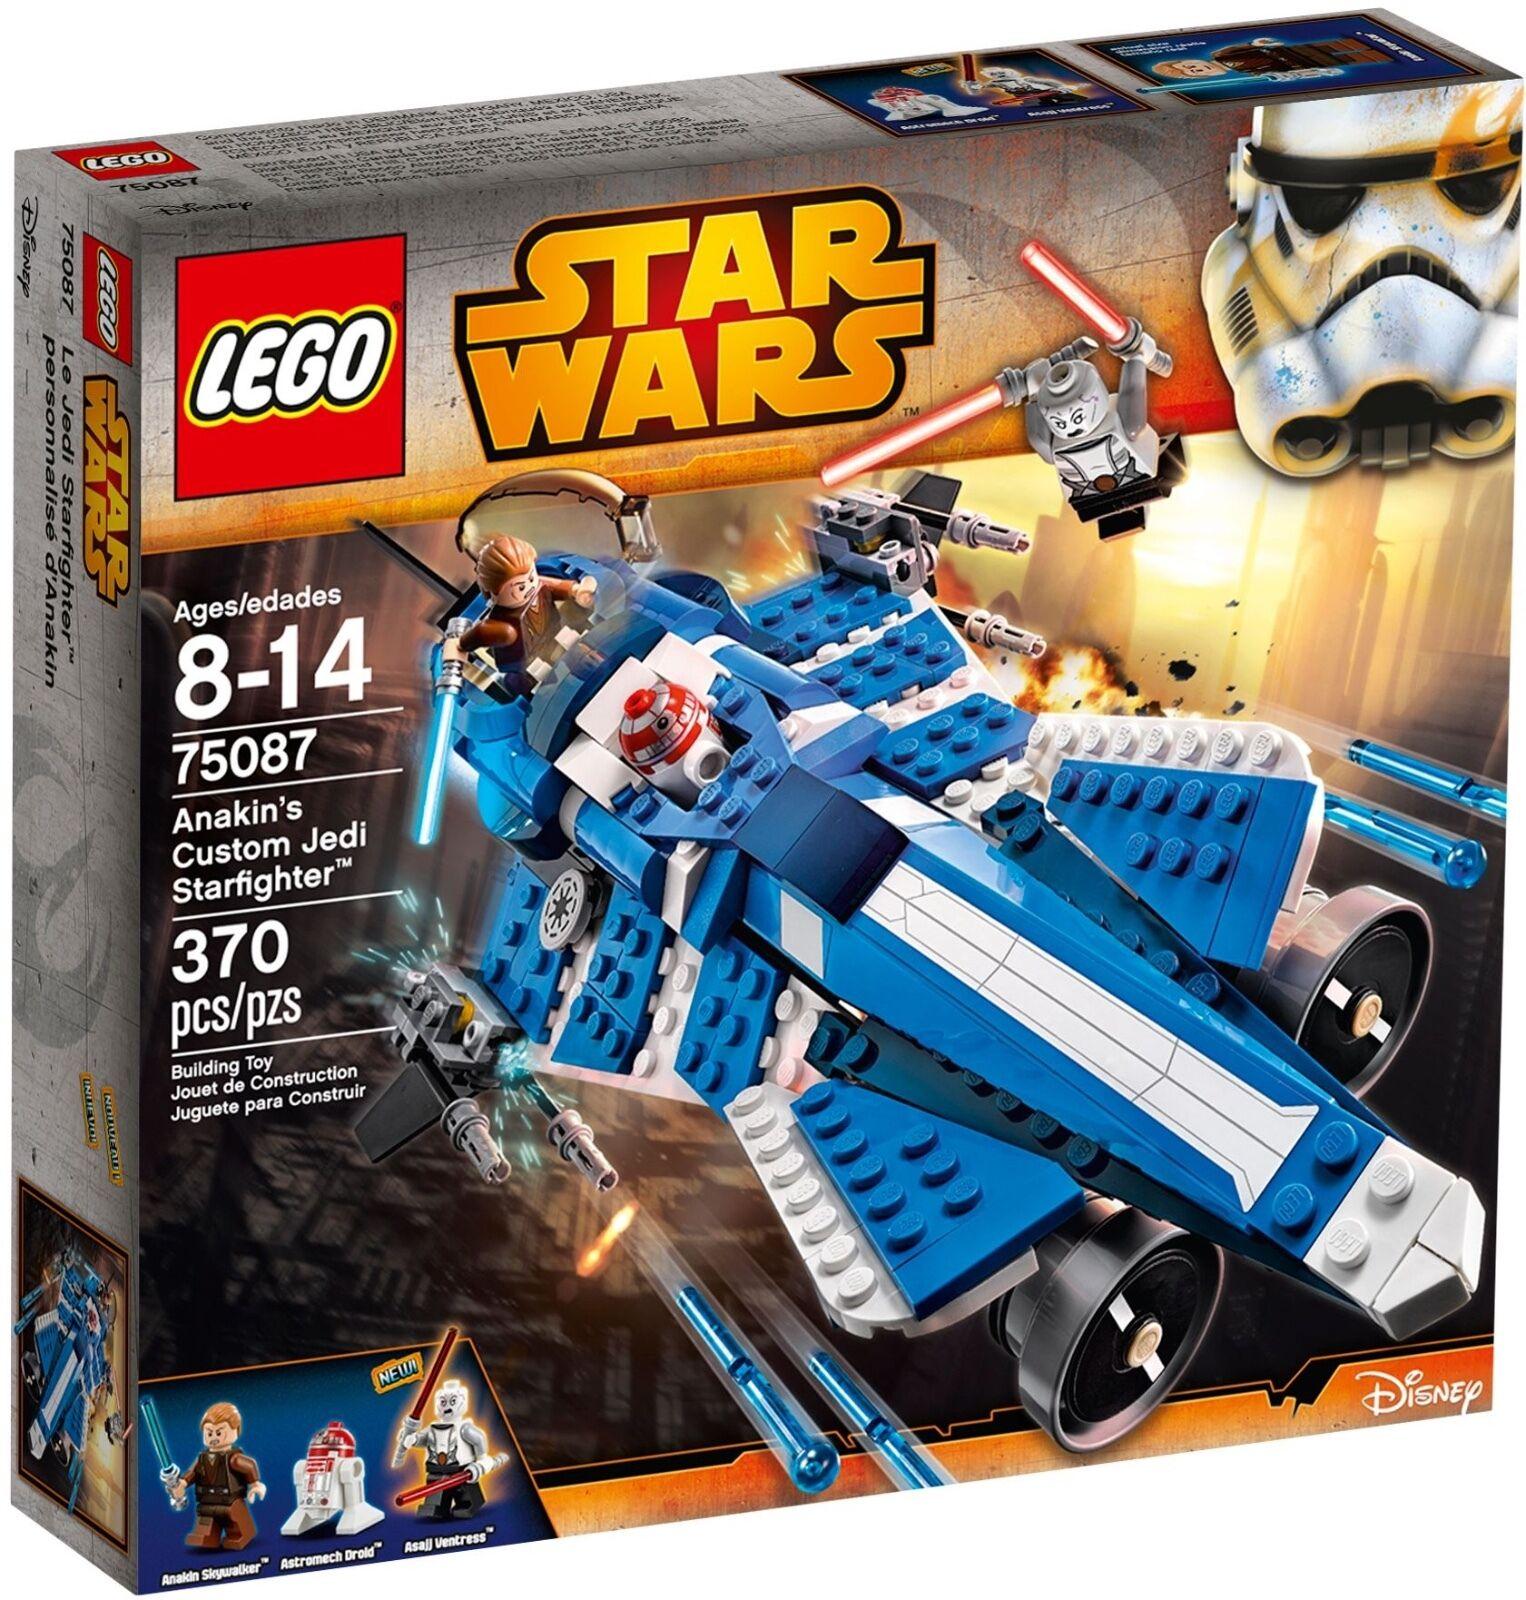 Lego ® star wars 75087-anakin 's custom custom custom jedi starfighter * retraité set-neuf * a8fe6b